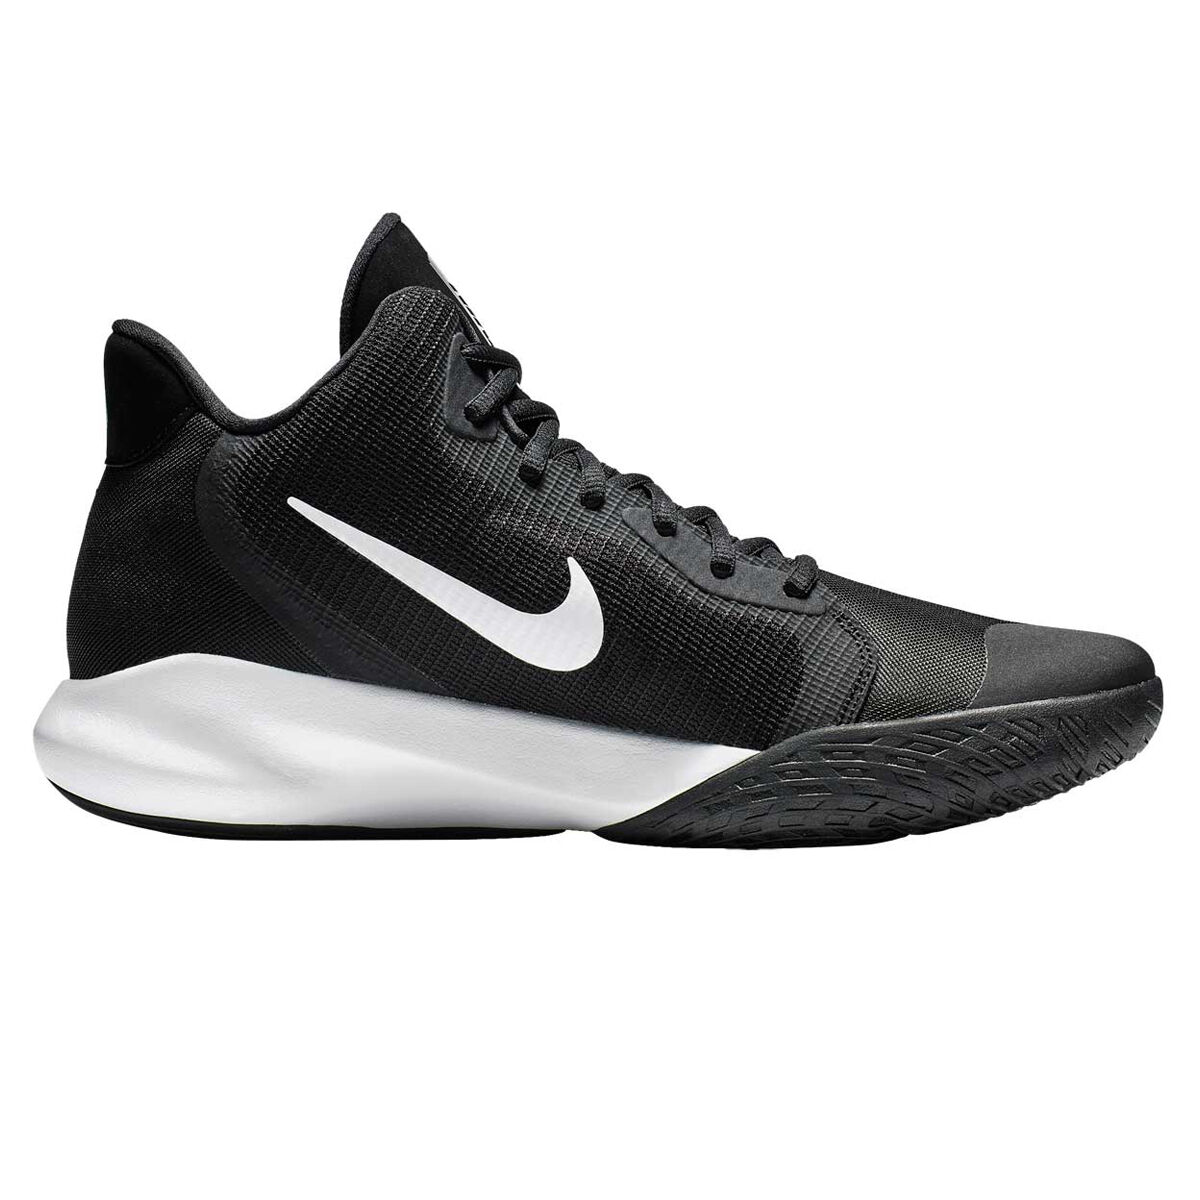 Nike Precision III Mens Basketball